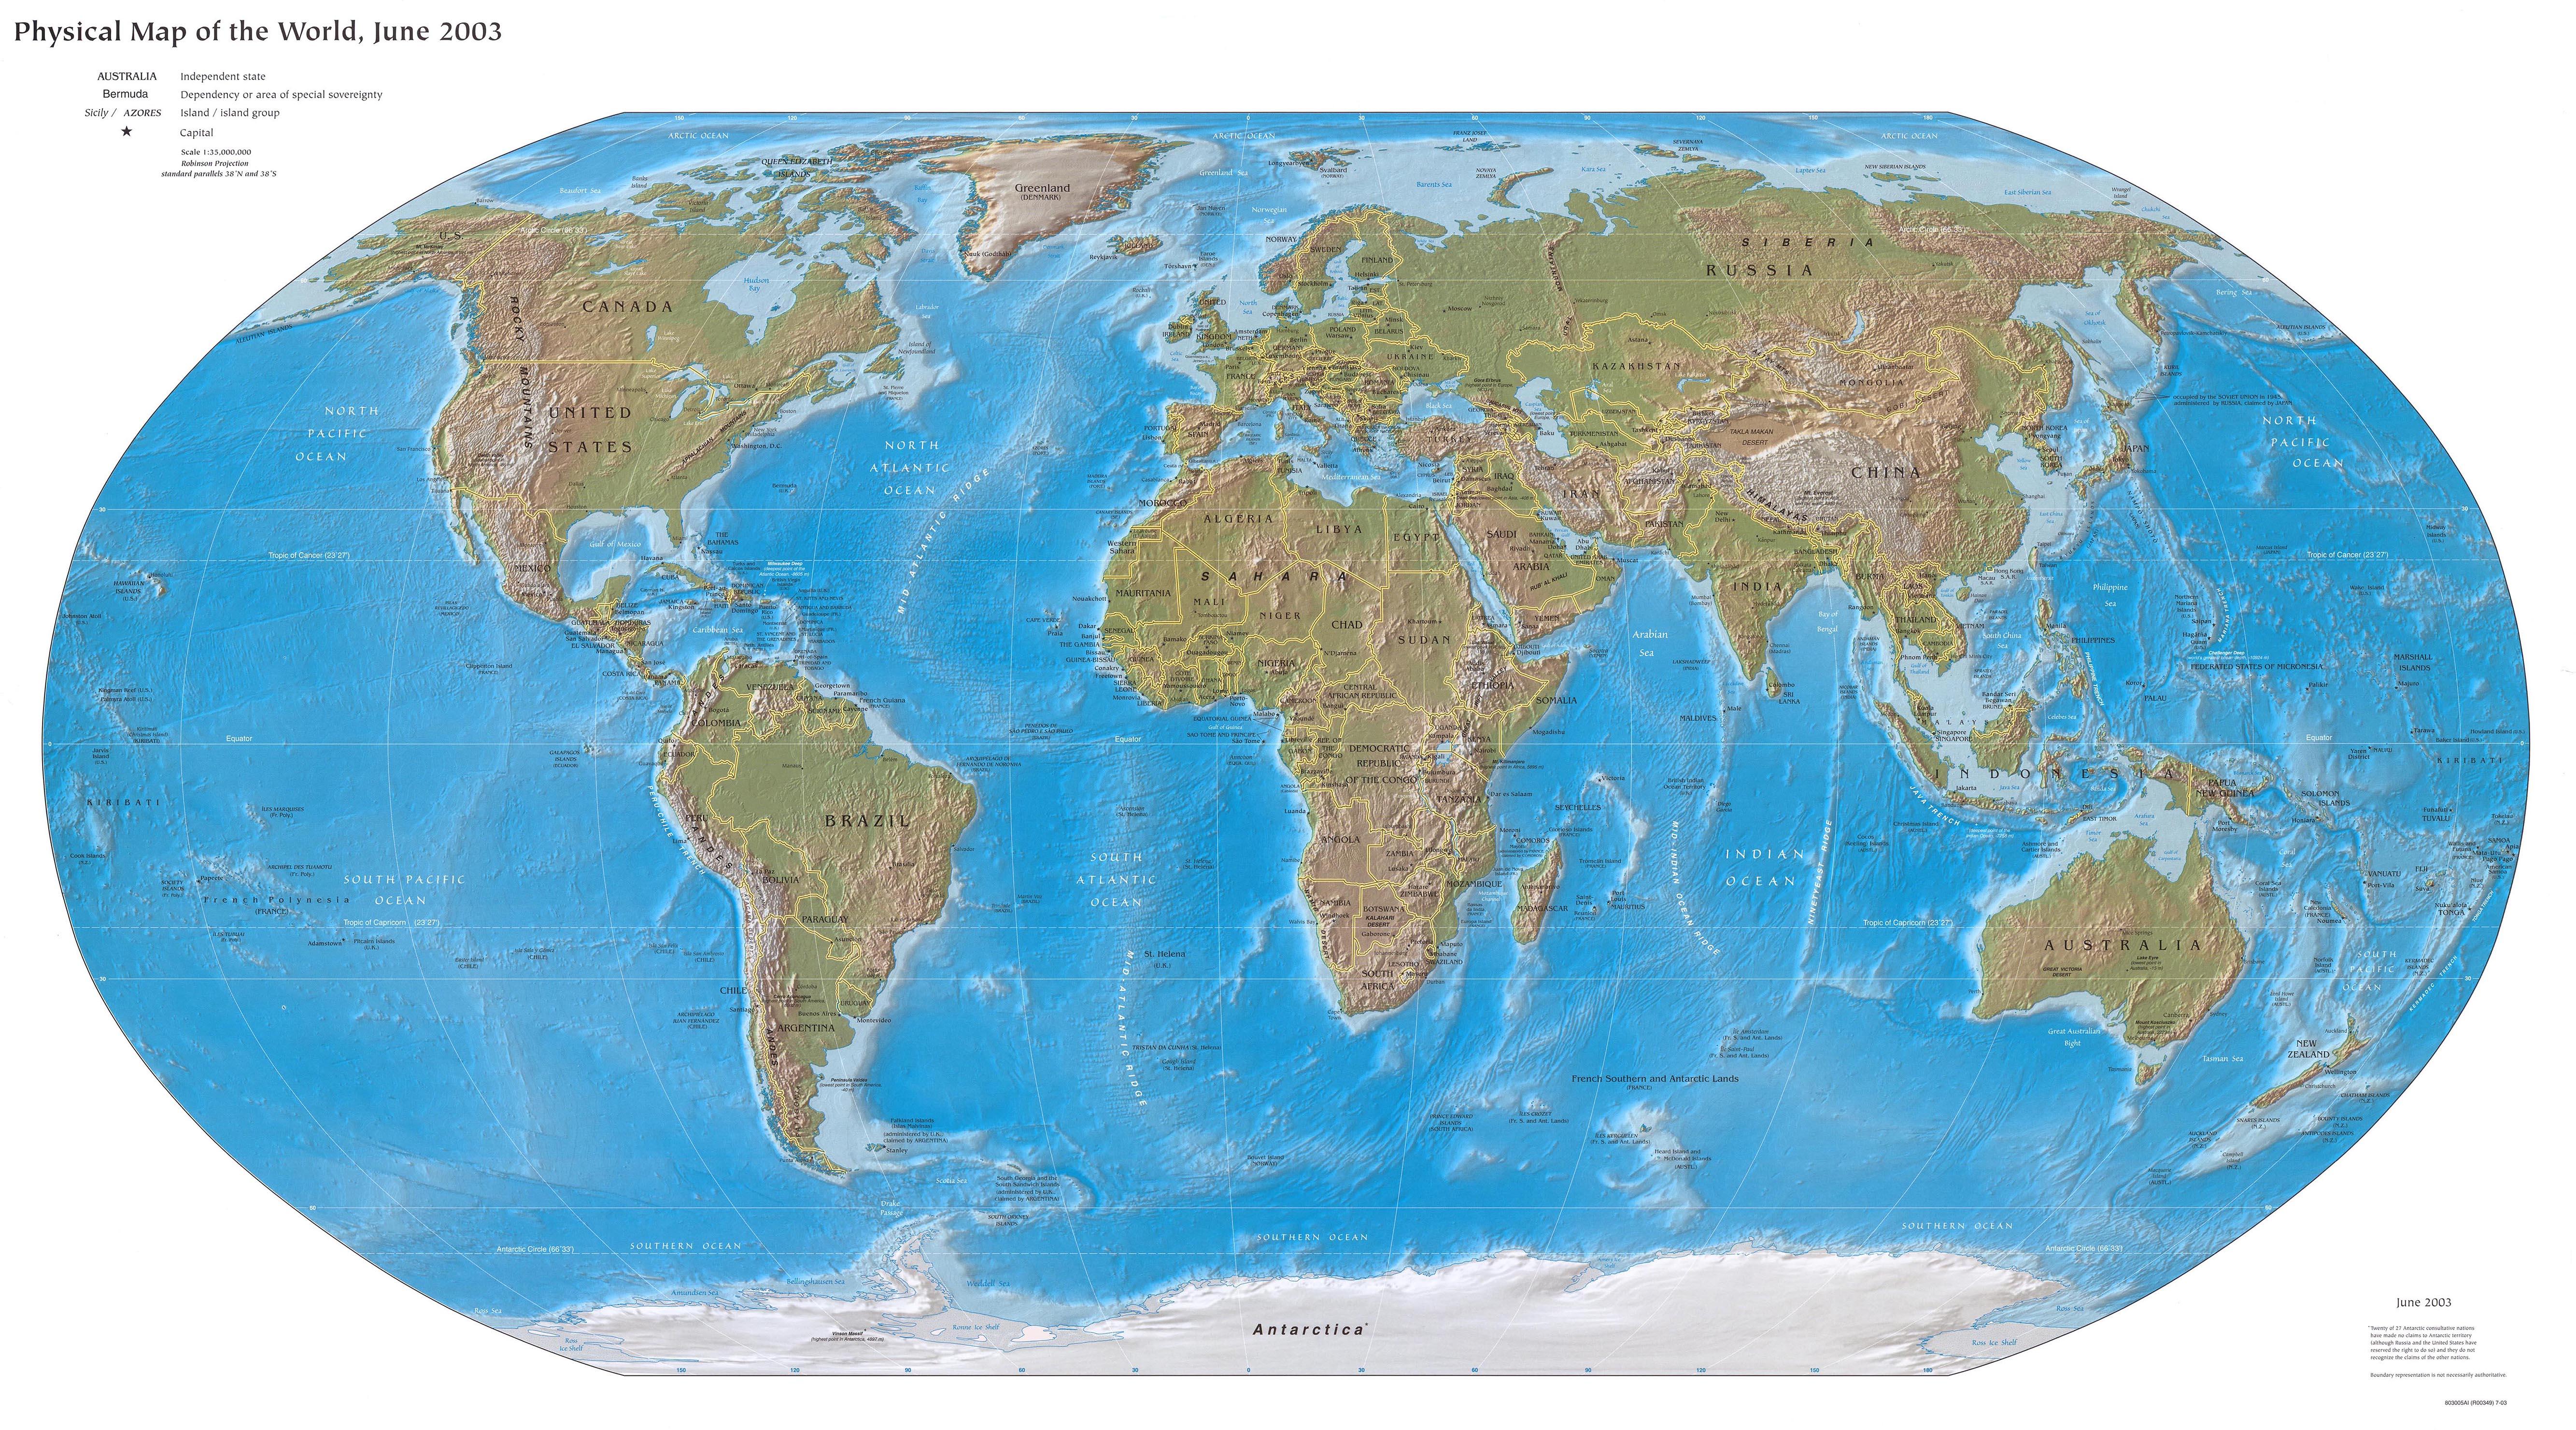 Mapa-Fisico-del-Mundo-2003-32